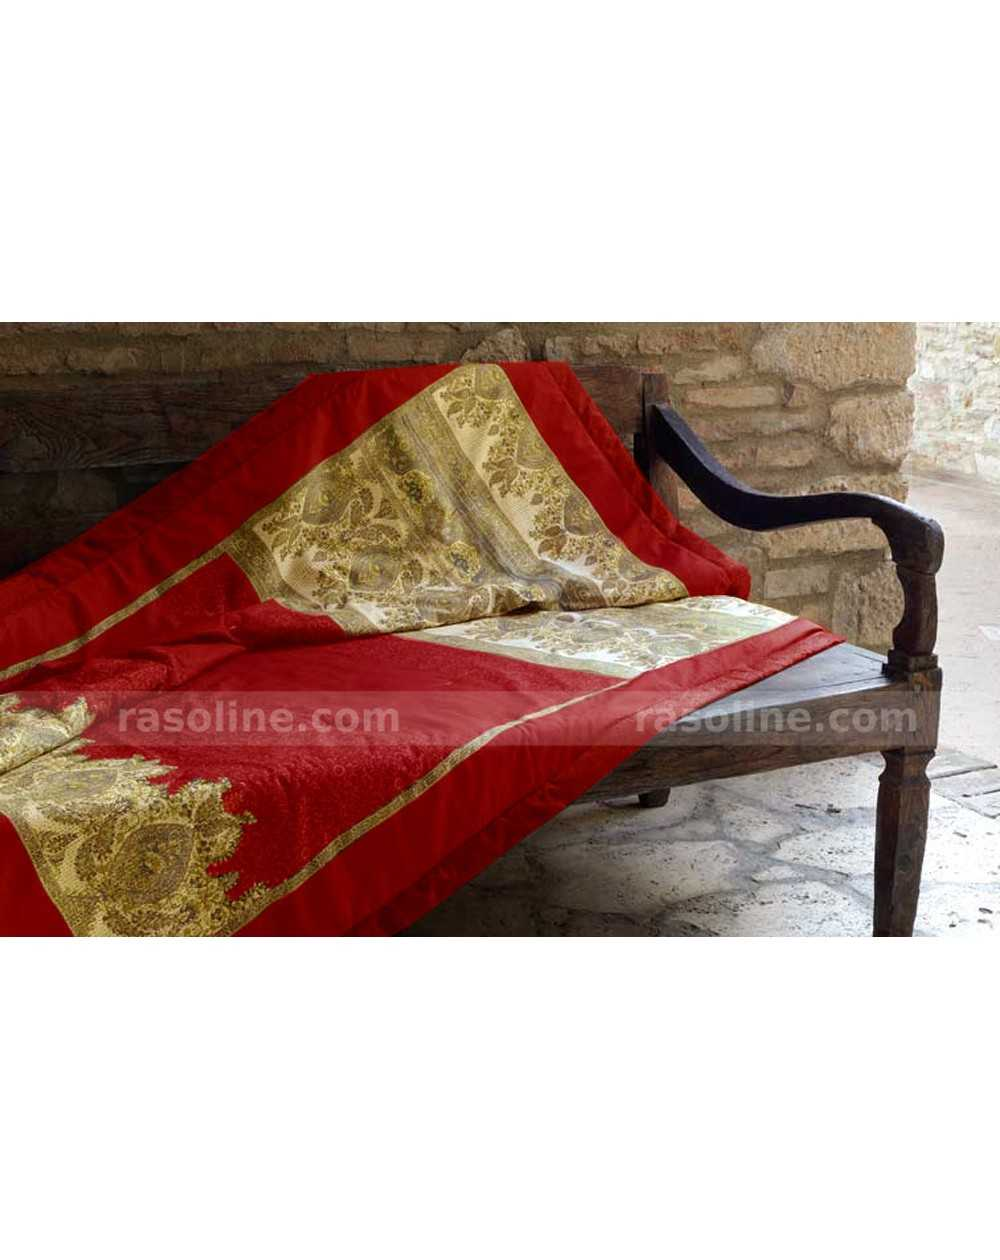 plaid bassetti granfoulard table de lit. Black Bedroom Furniture Sets. Home Design Ideas